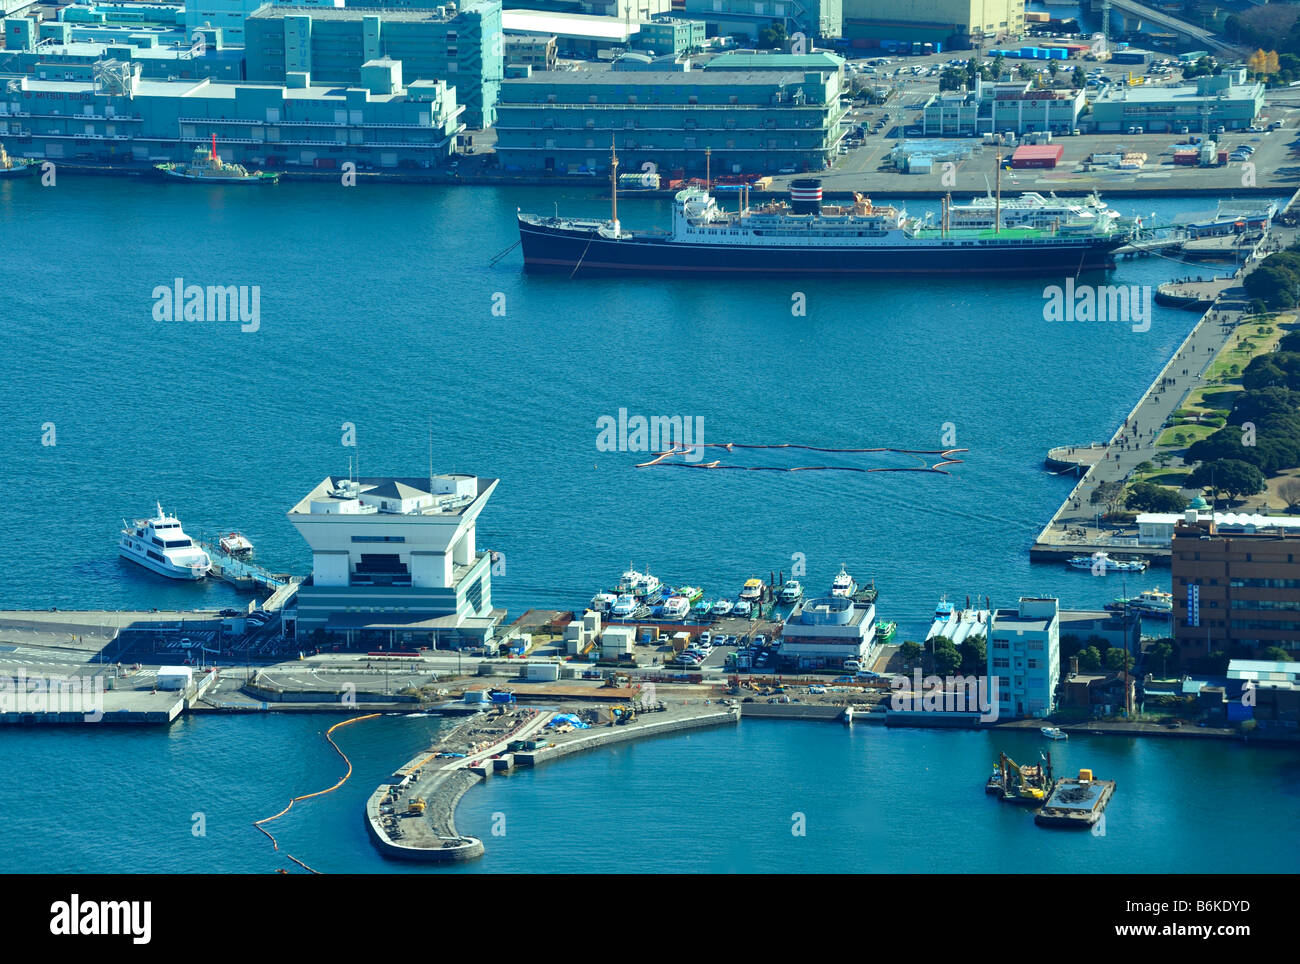 The Osanbashi Pier and the NYK Hikawa Maru (Aerial View), Yokohama JP - Stock Image